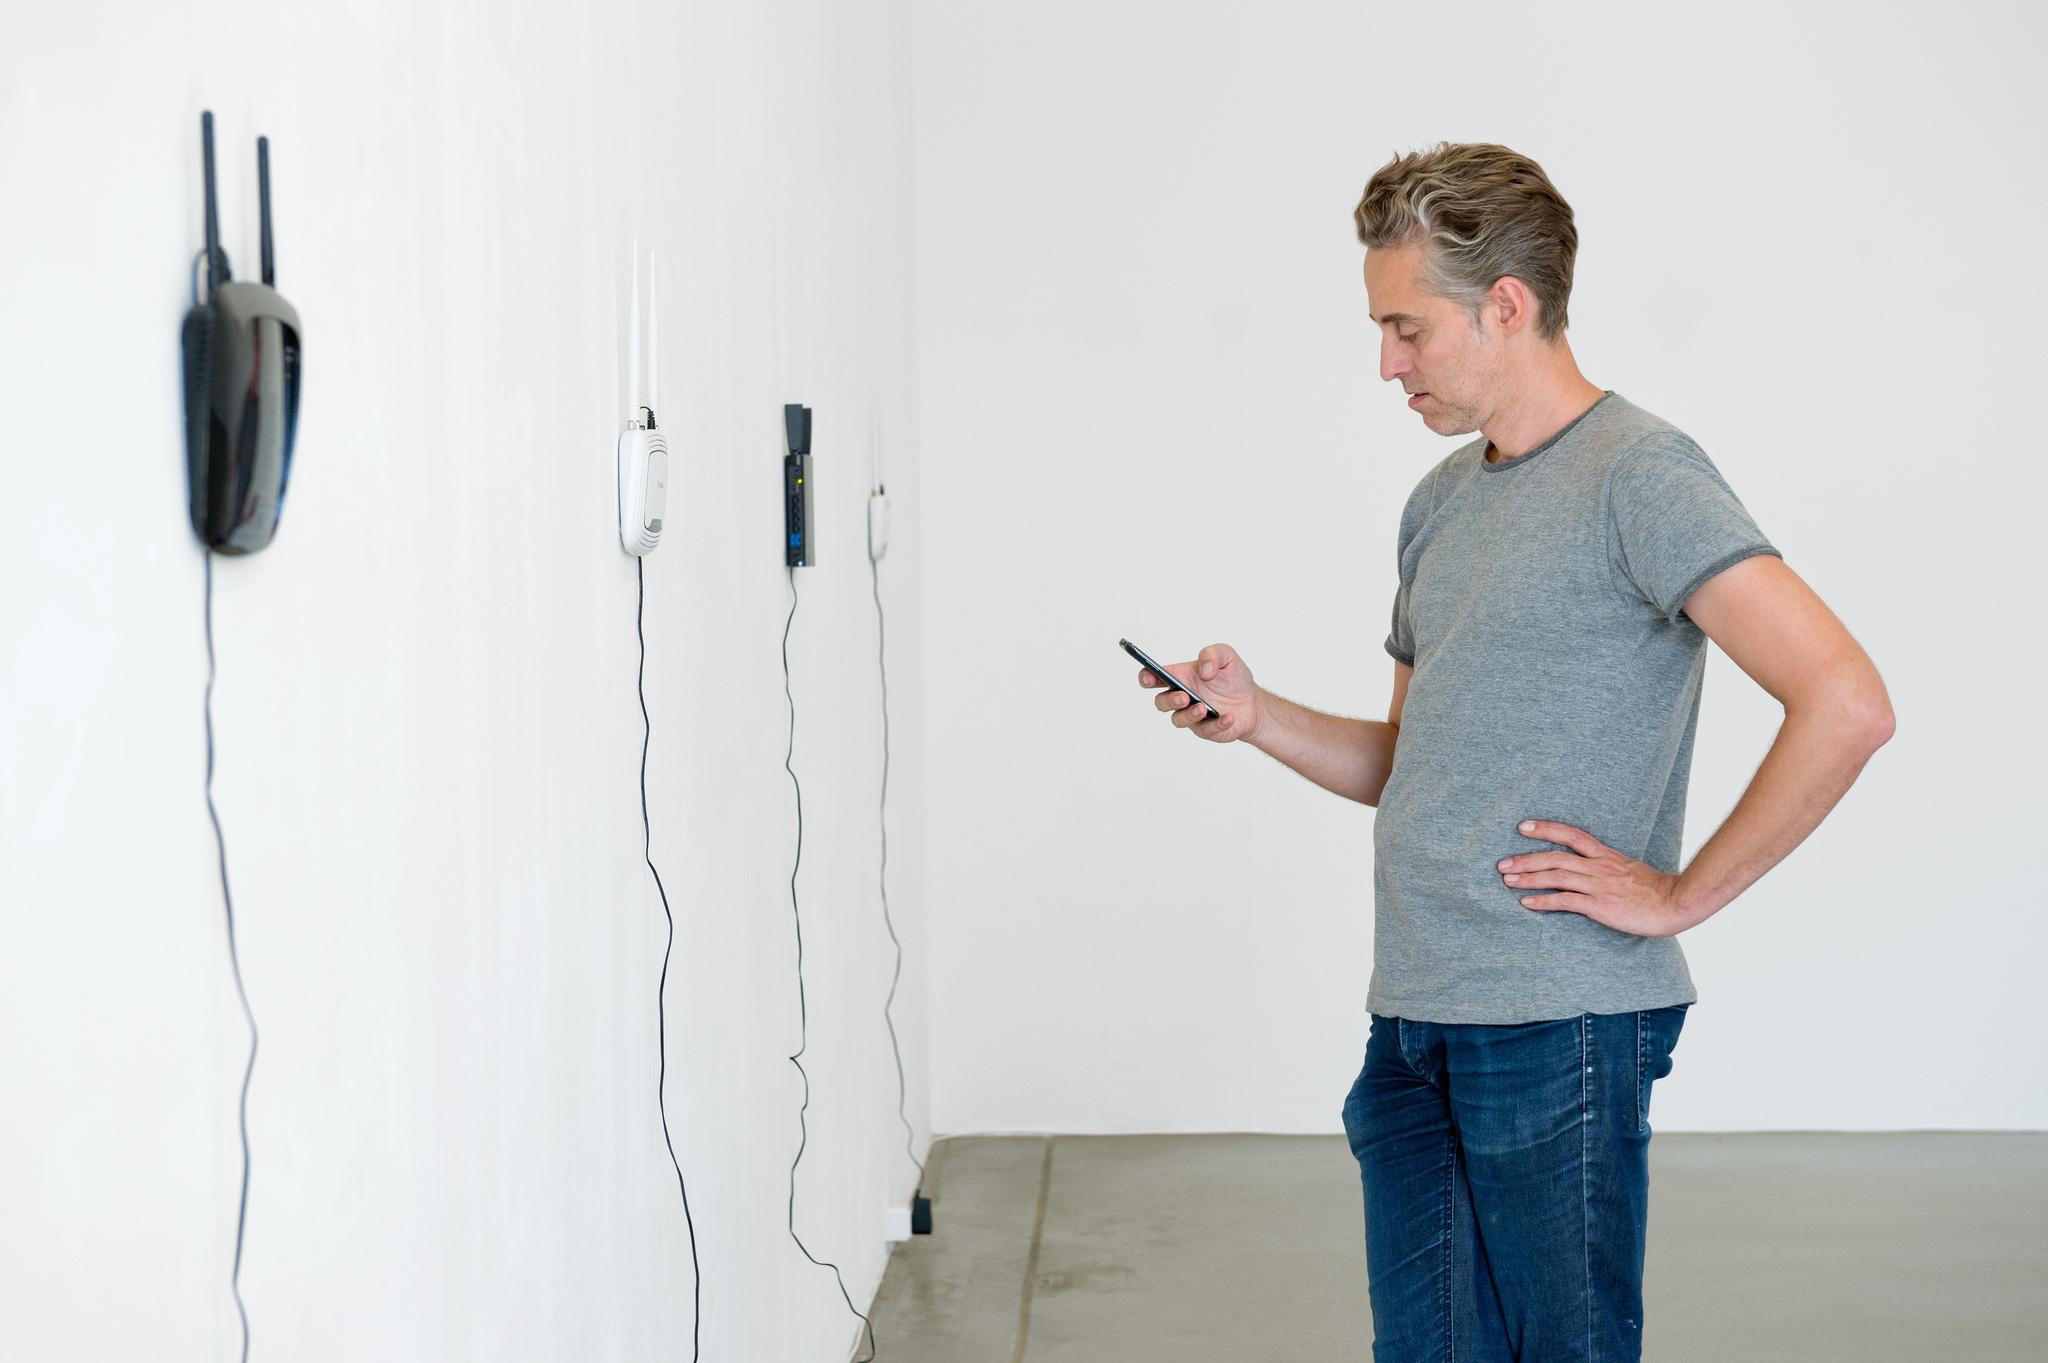 aoffline-art-hardcore-kasseler-kunstverein-2013